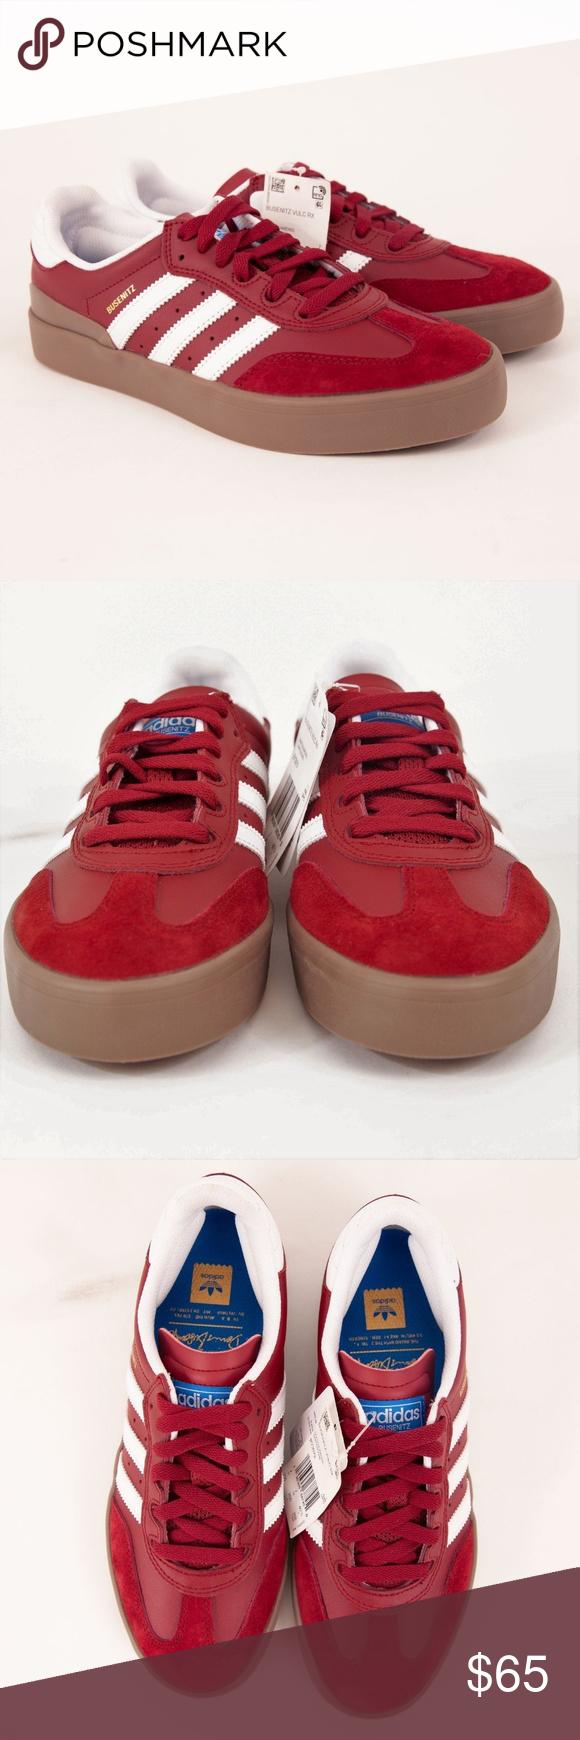 new product 492f0 f4714 Adidas Busenitz Vulc RX Athletic Shoes BY3979 Adidas Men s Busenitz Vulc RX  Shoes Sneakers Burgundy